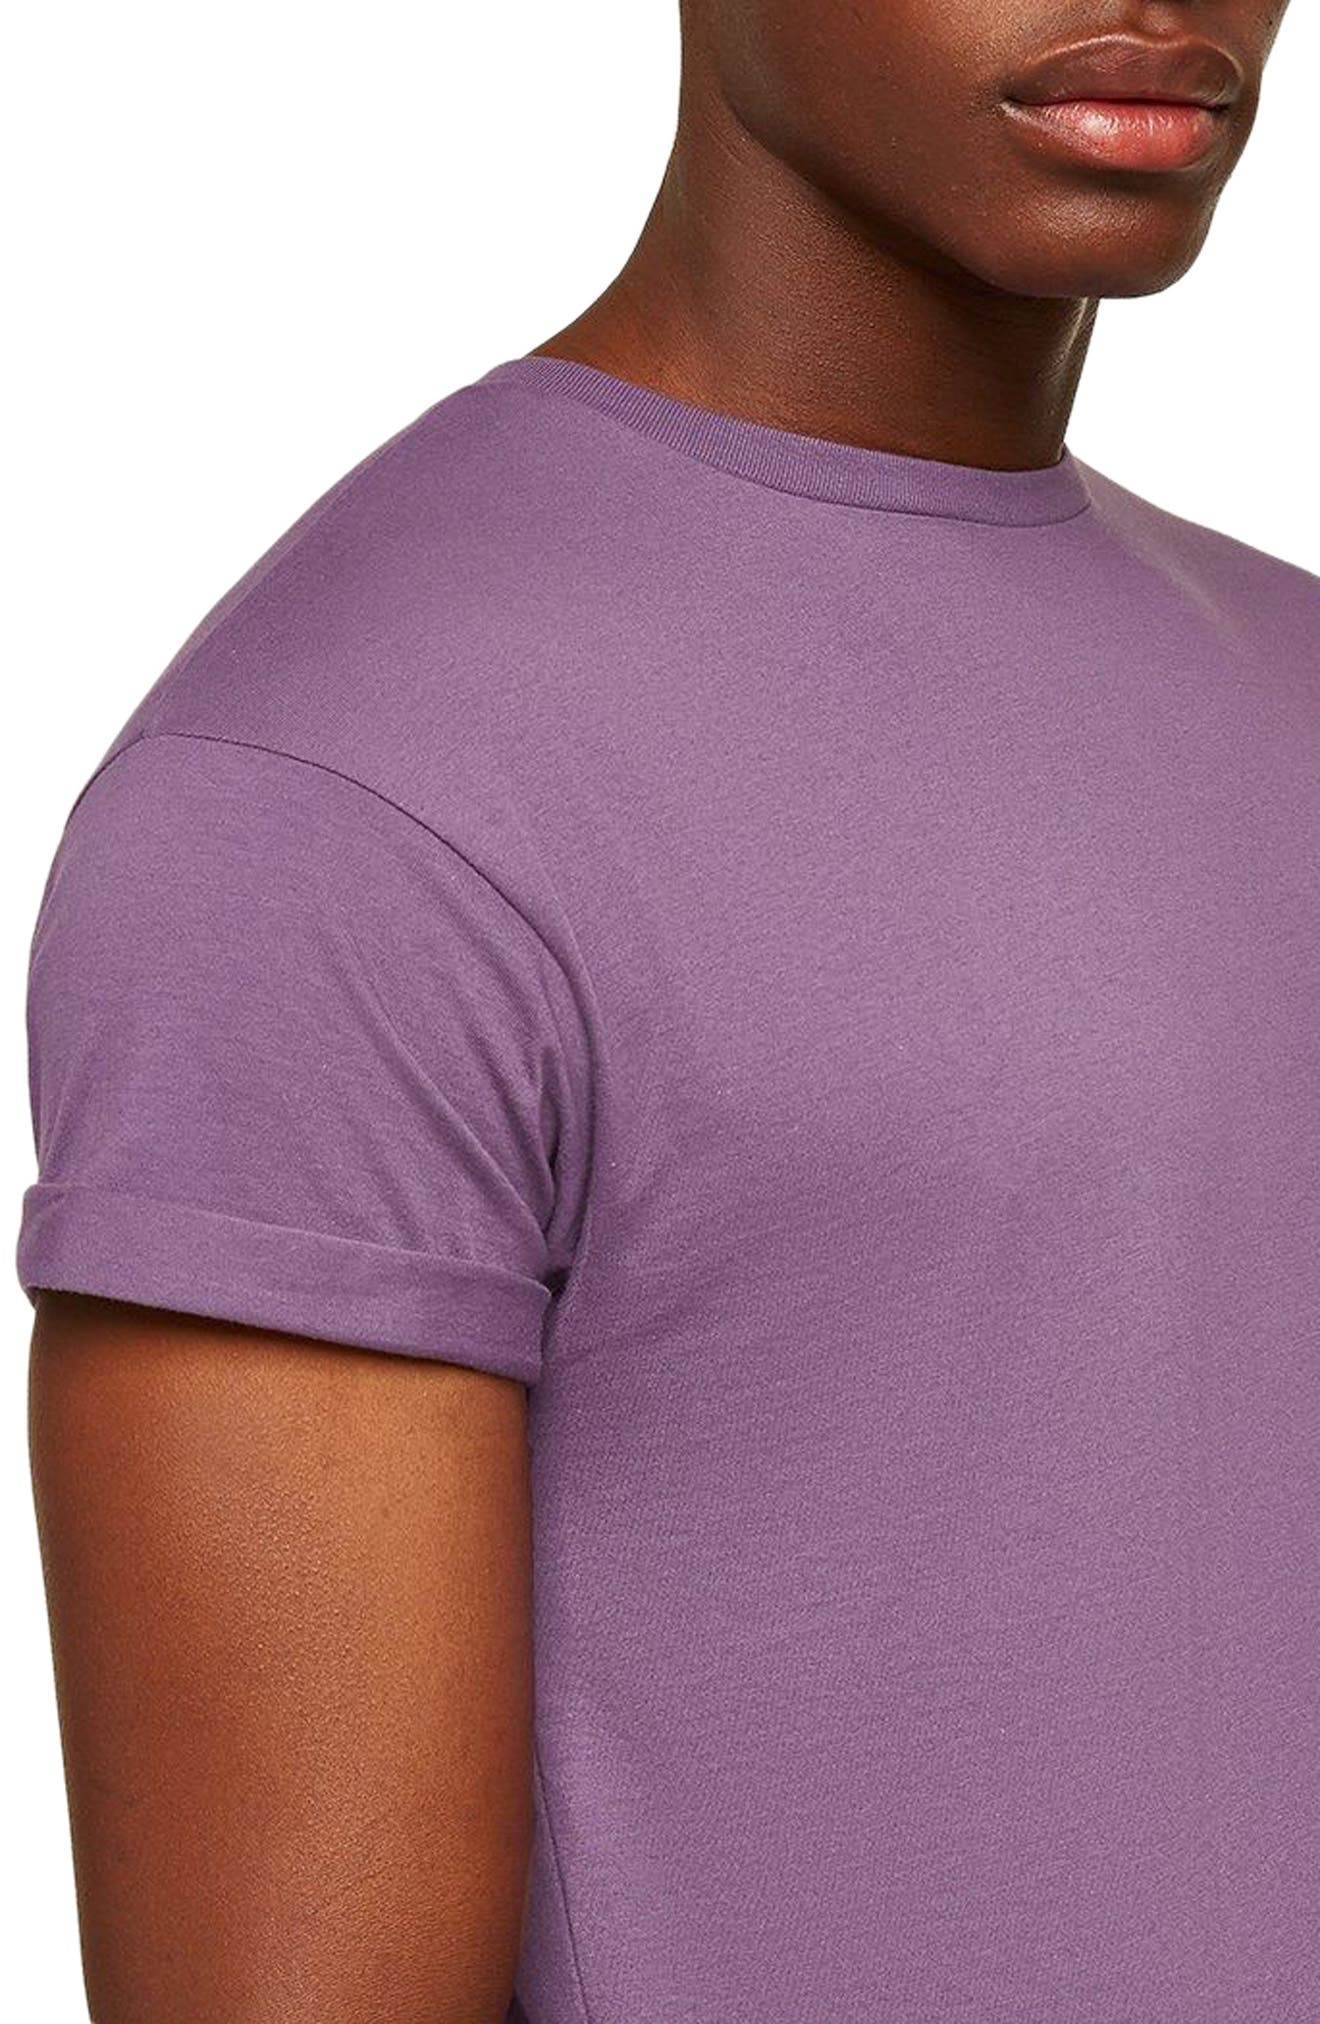 Muscle Fit Roller T-Shirt,                             Alternate thumbnail 3, color,                             Medium Purple